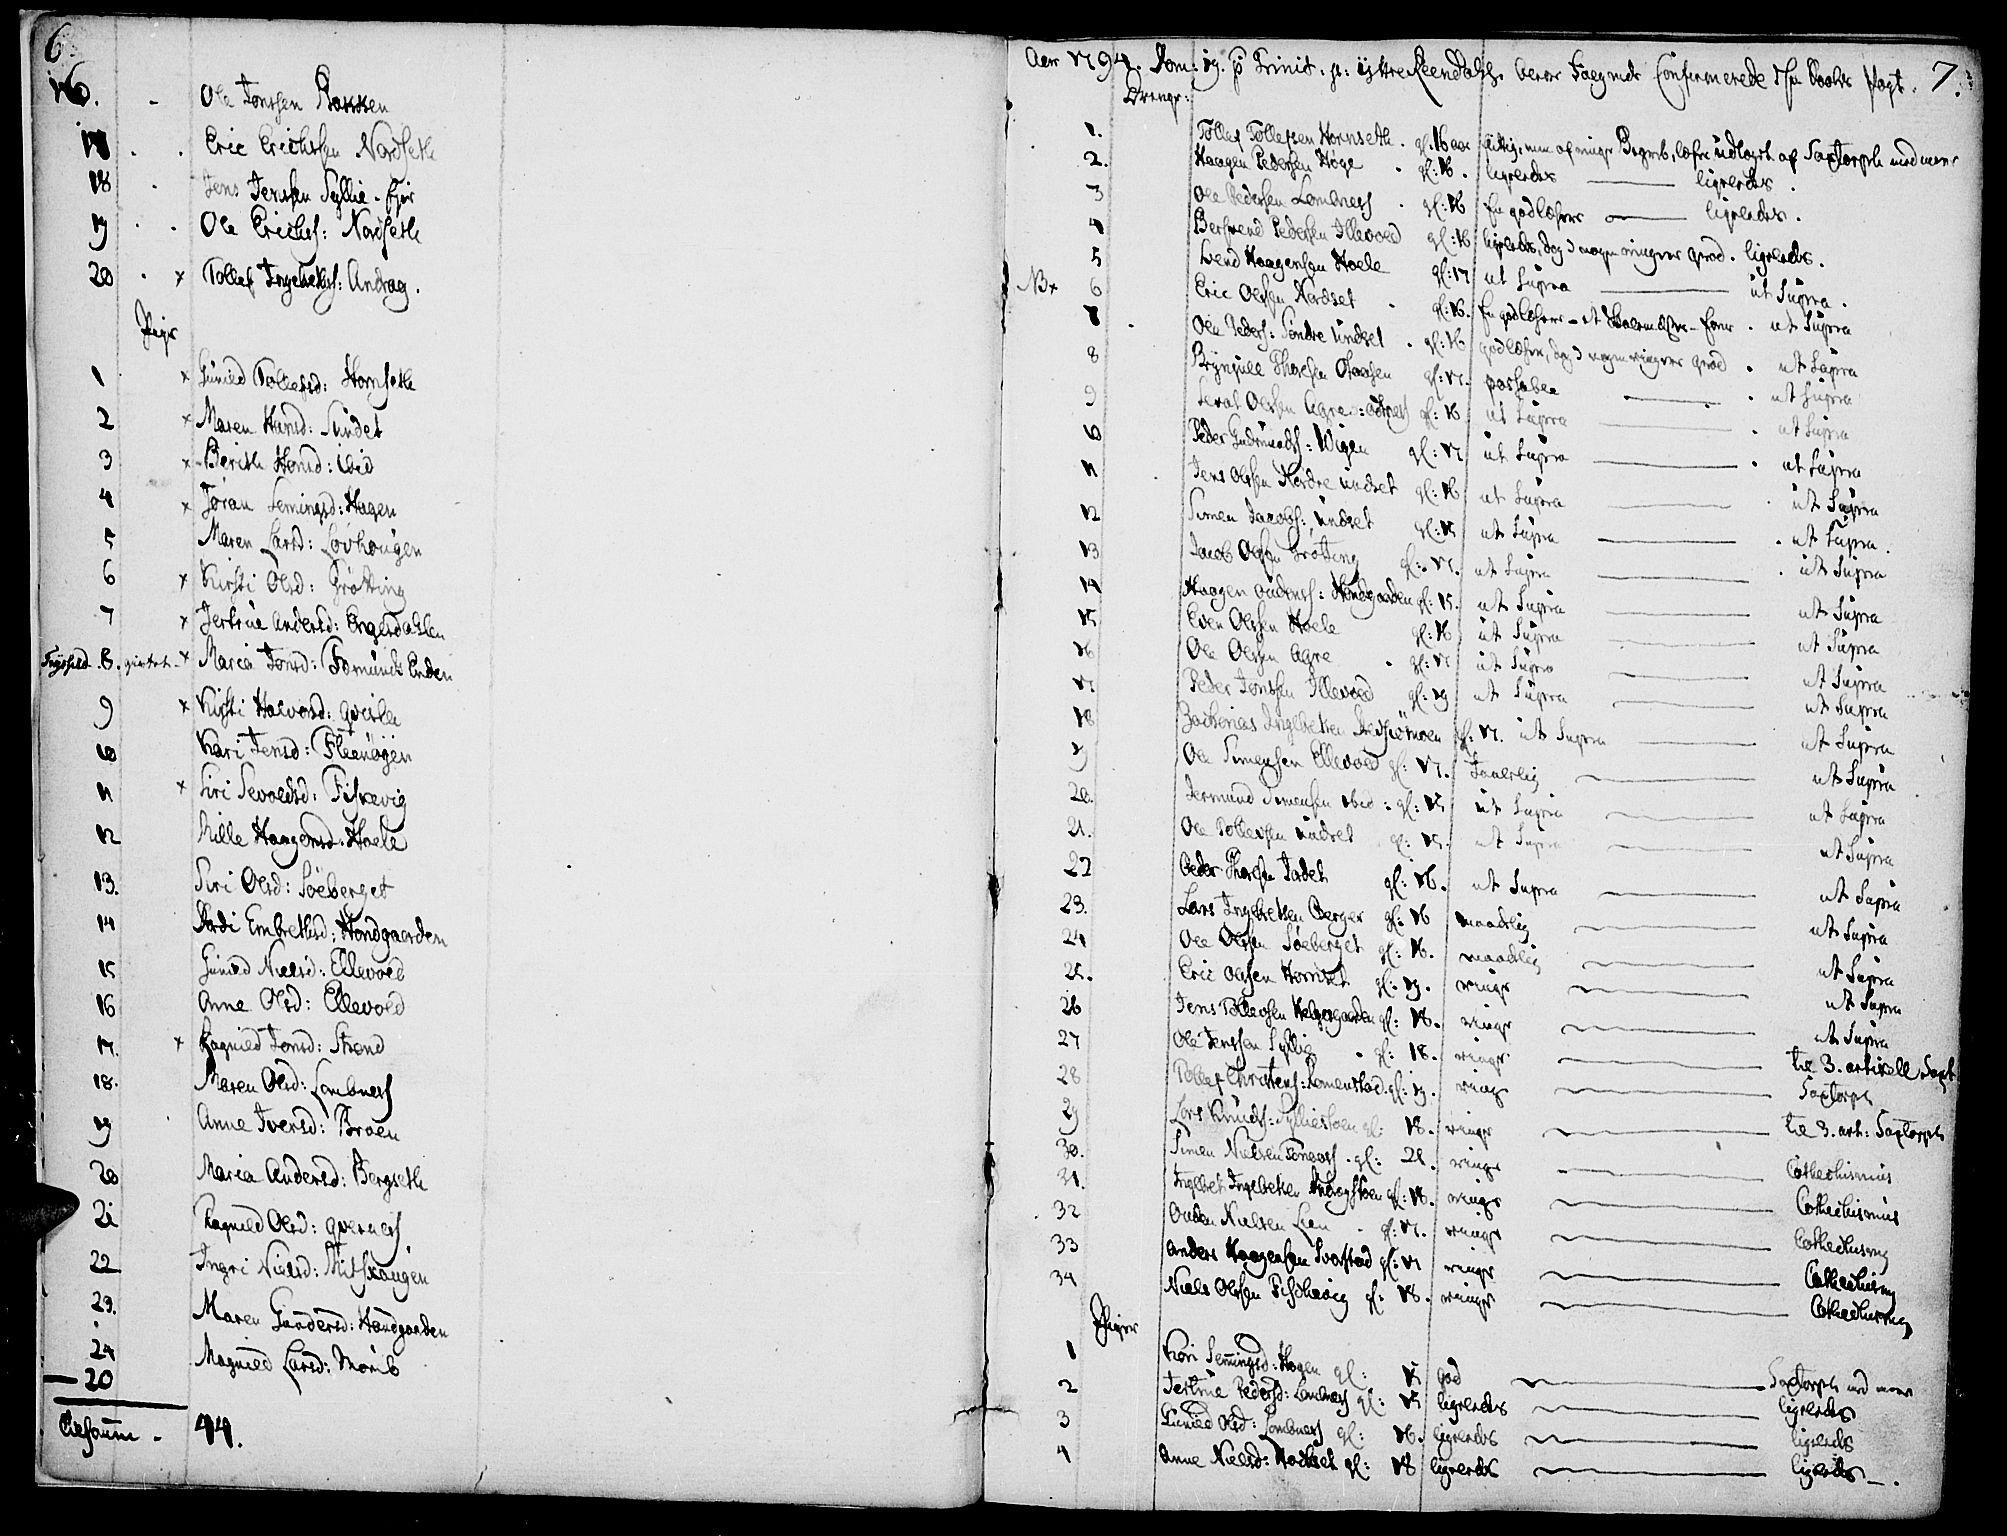 SAH, Rendalen prestekontor, H/Ha/Haa/L0002: Ministerialbok nr. 2, 1788-1814, s. 6-7